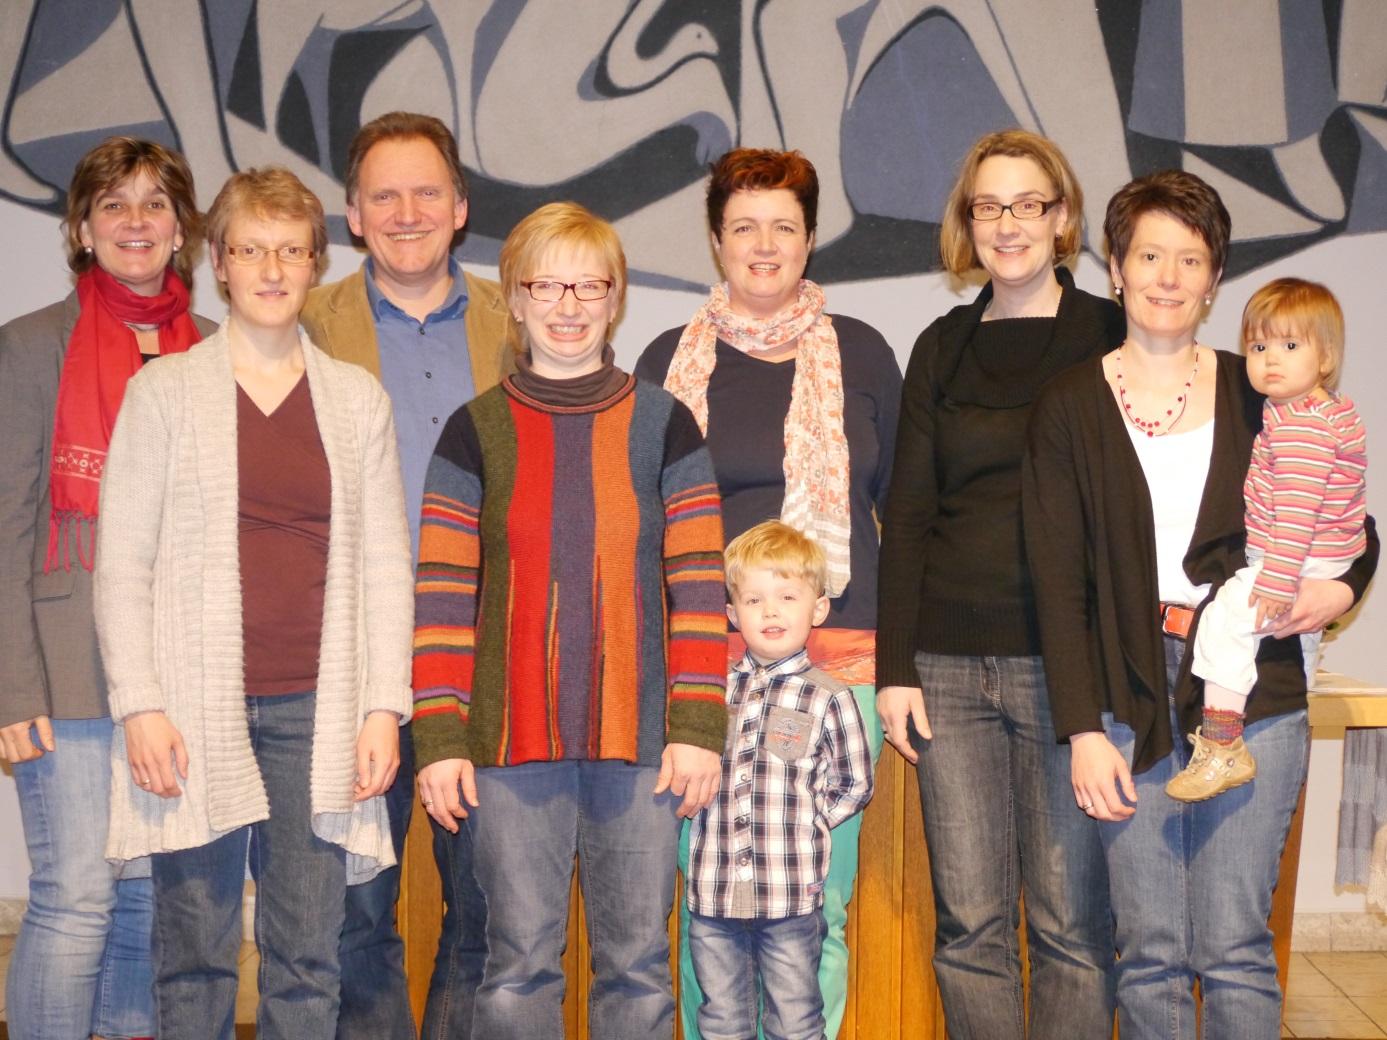 Das Krabbelgottesdienstteam v.r: Simone Neuser-Buch, Dagmar Schäfers, Diana Kolb, Alexander Kotthaus, Pfarrer Frank Boes, Jessica Jung, Charlotte Boes